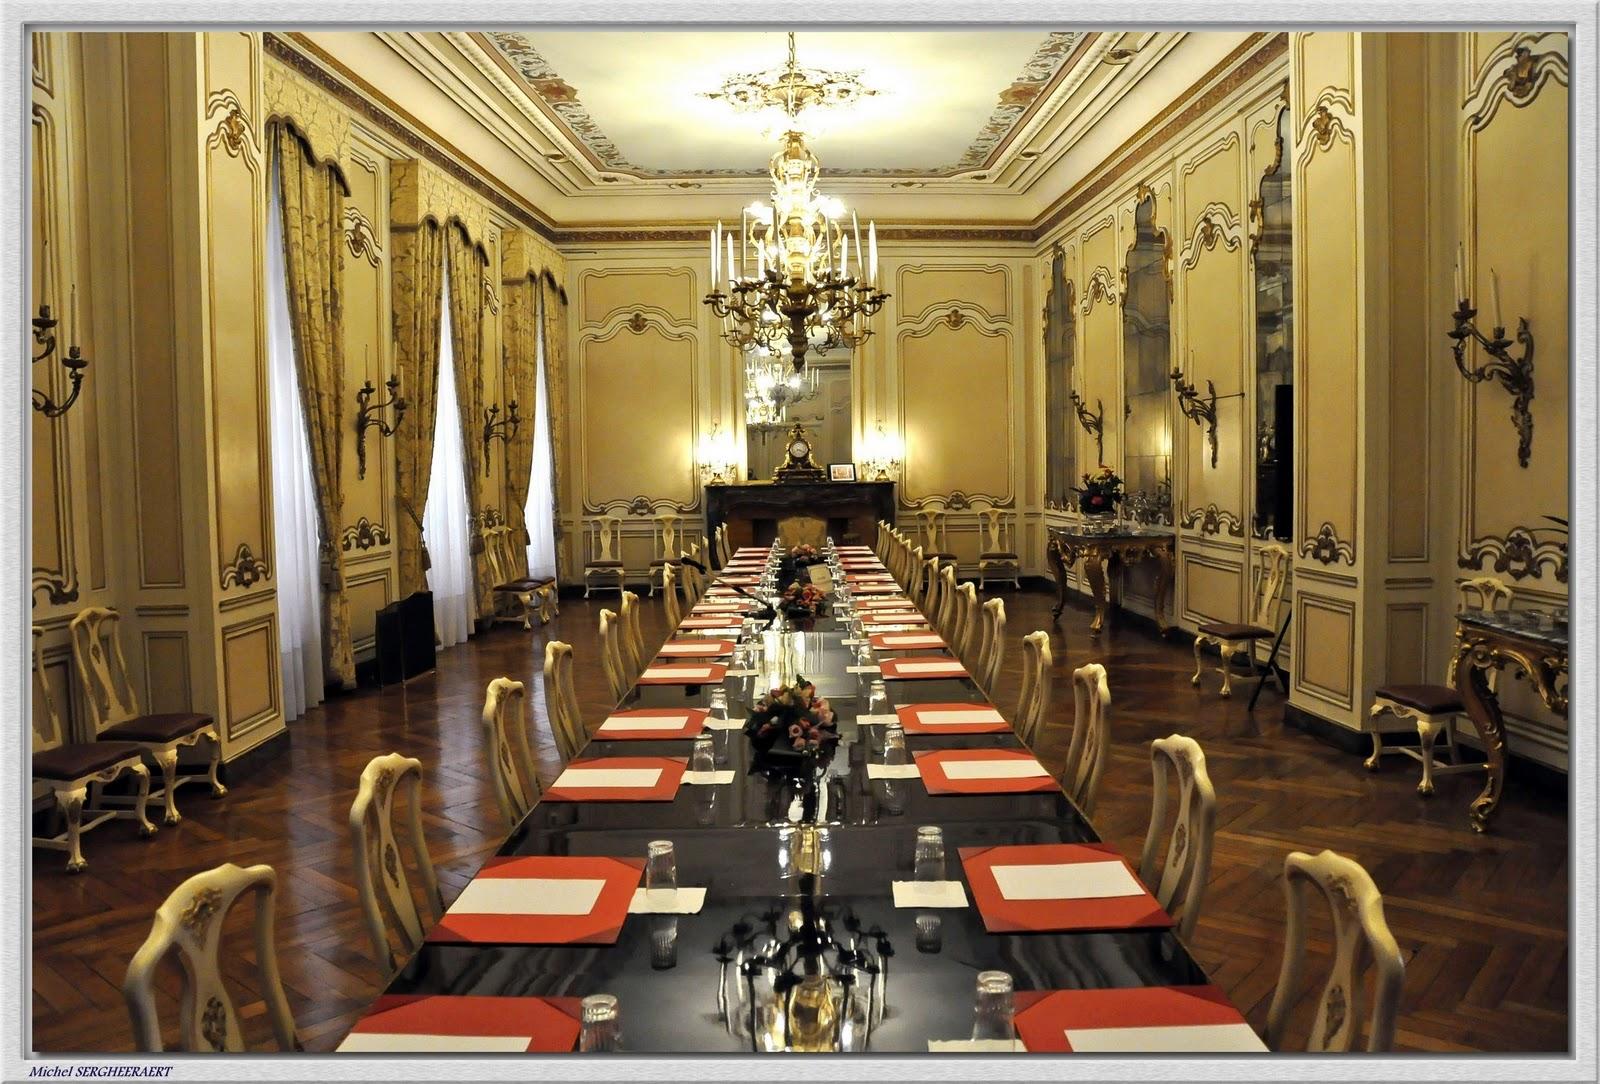 chtivenol photos le palais des rois de sardaigne nice. Black Bedroom Furniture Sets. Home Design Ideas